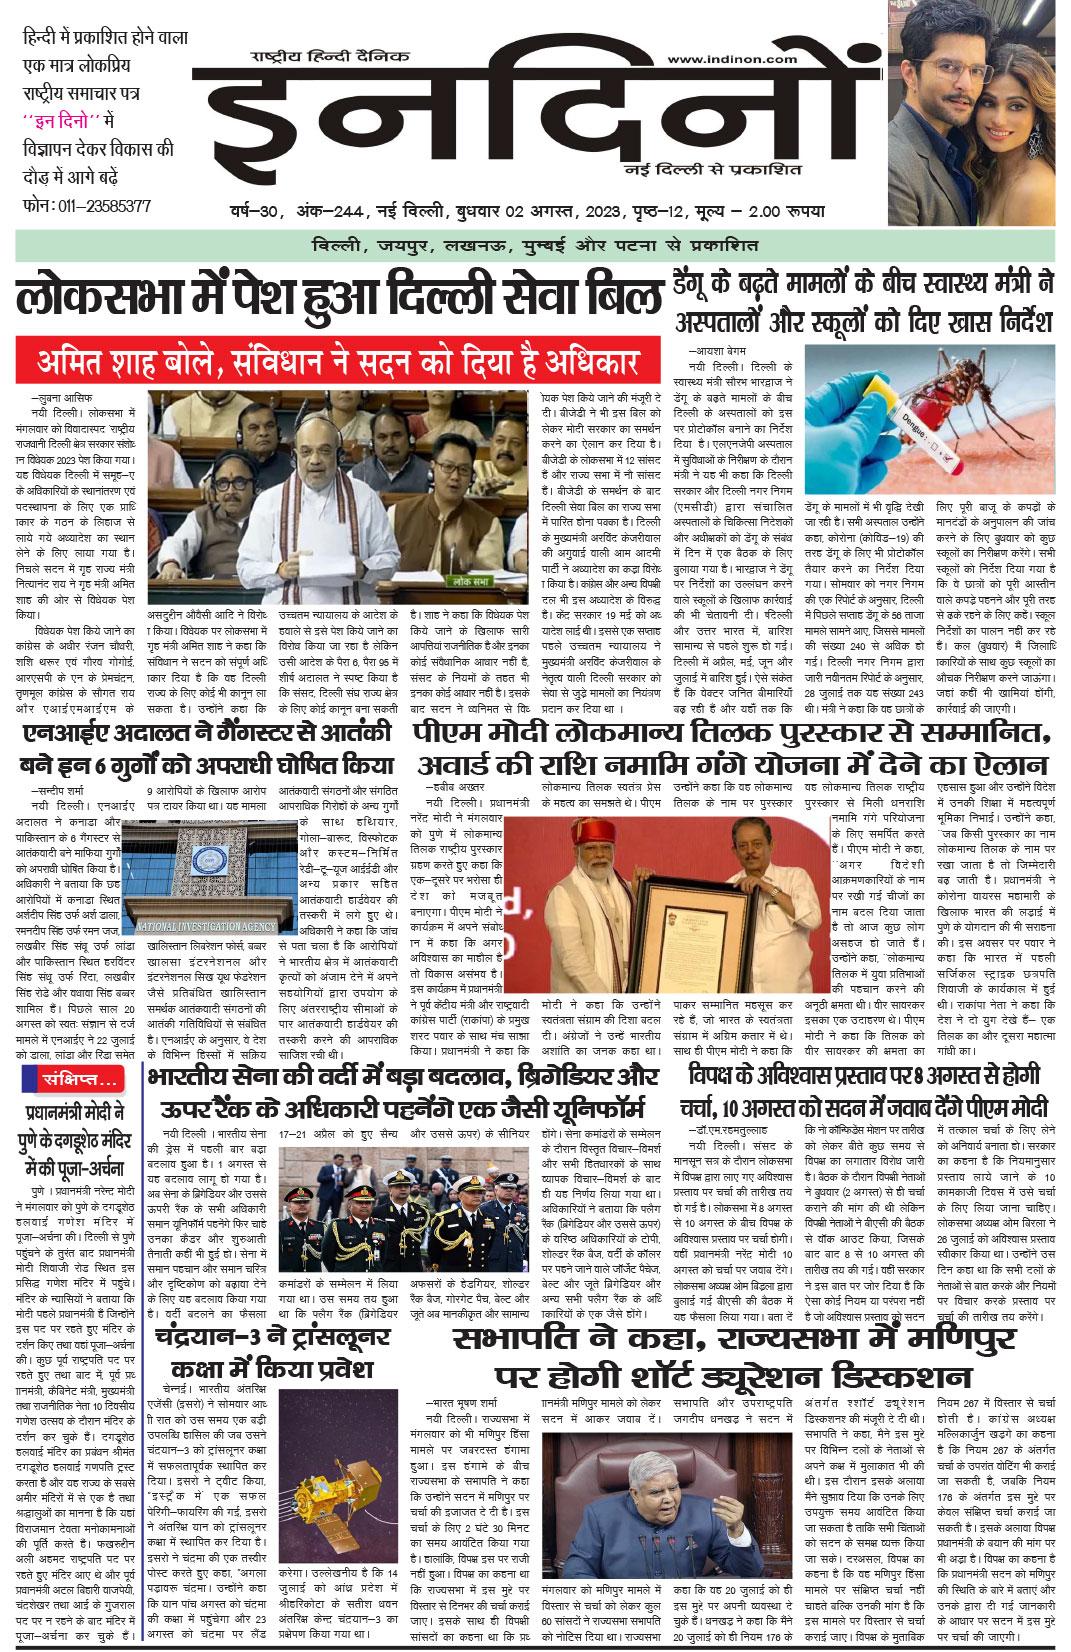 news india website